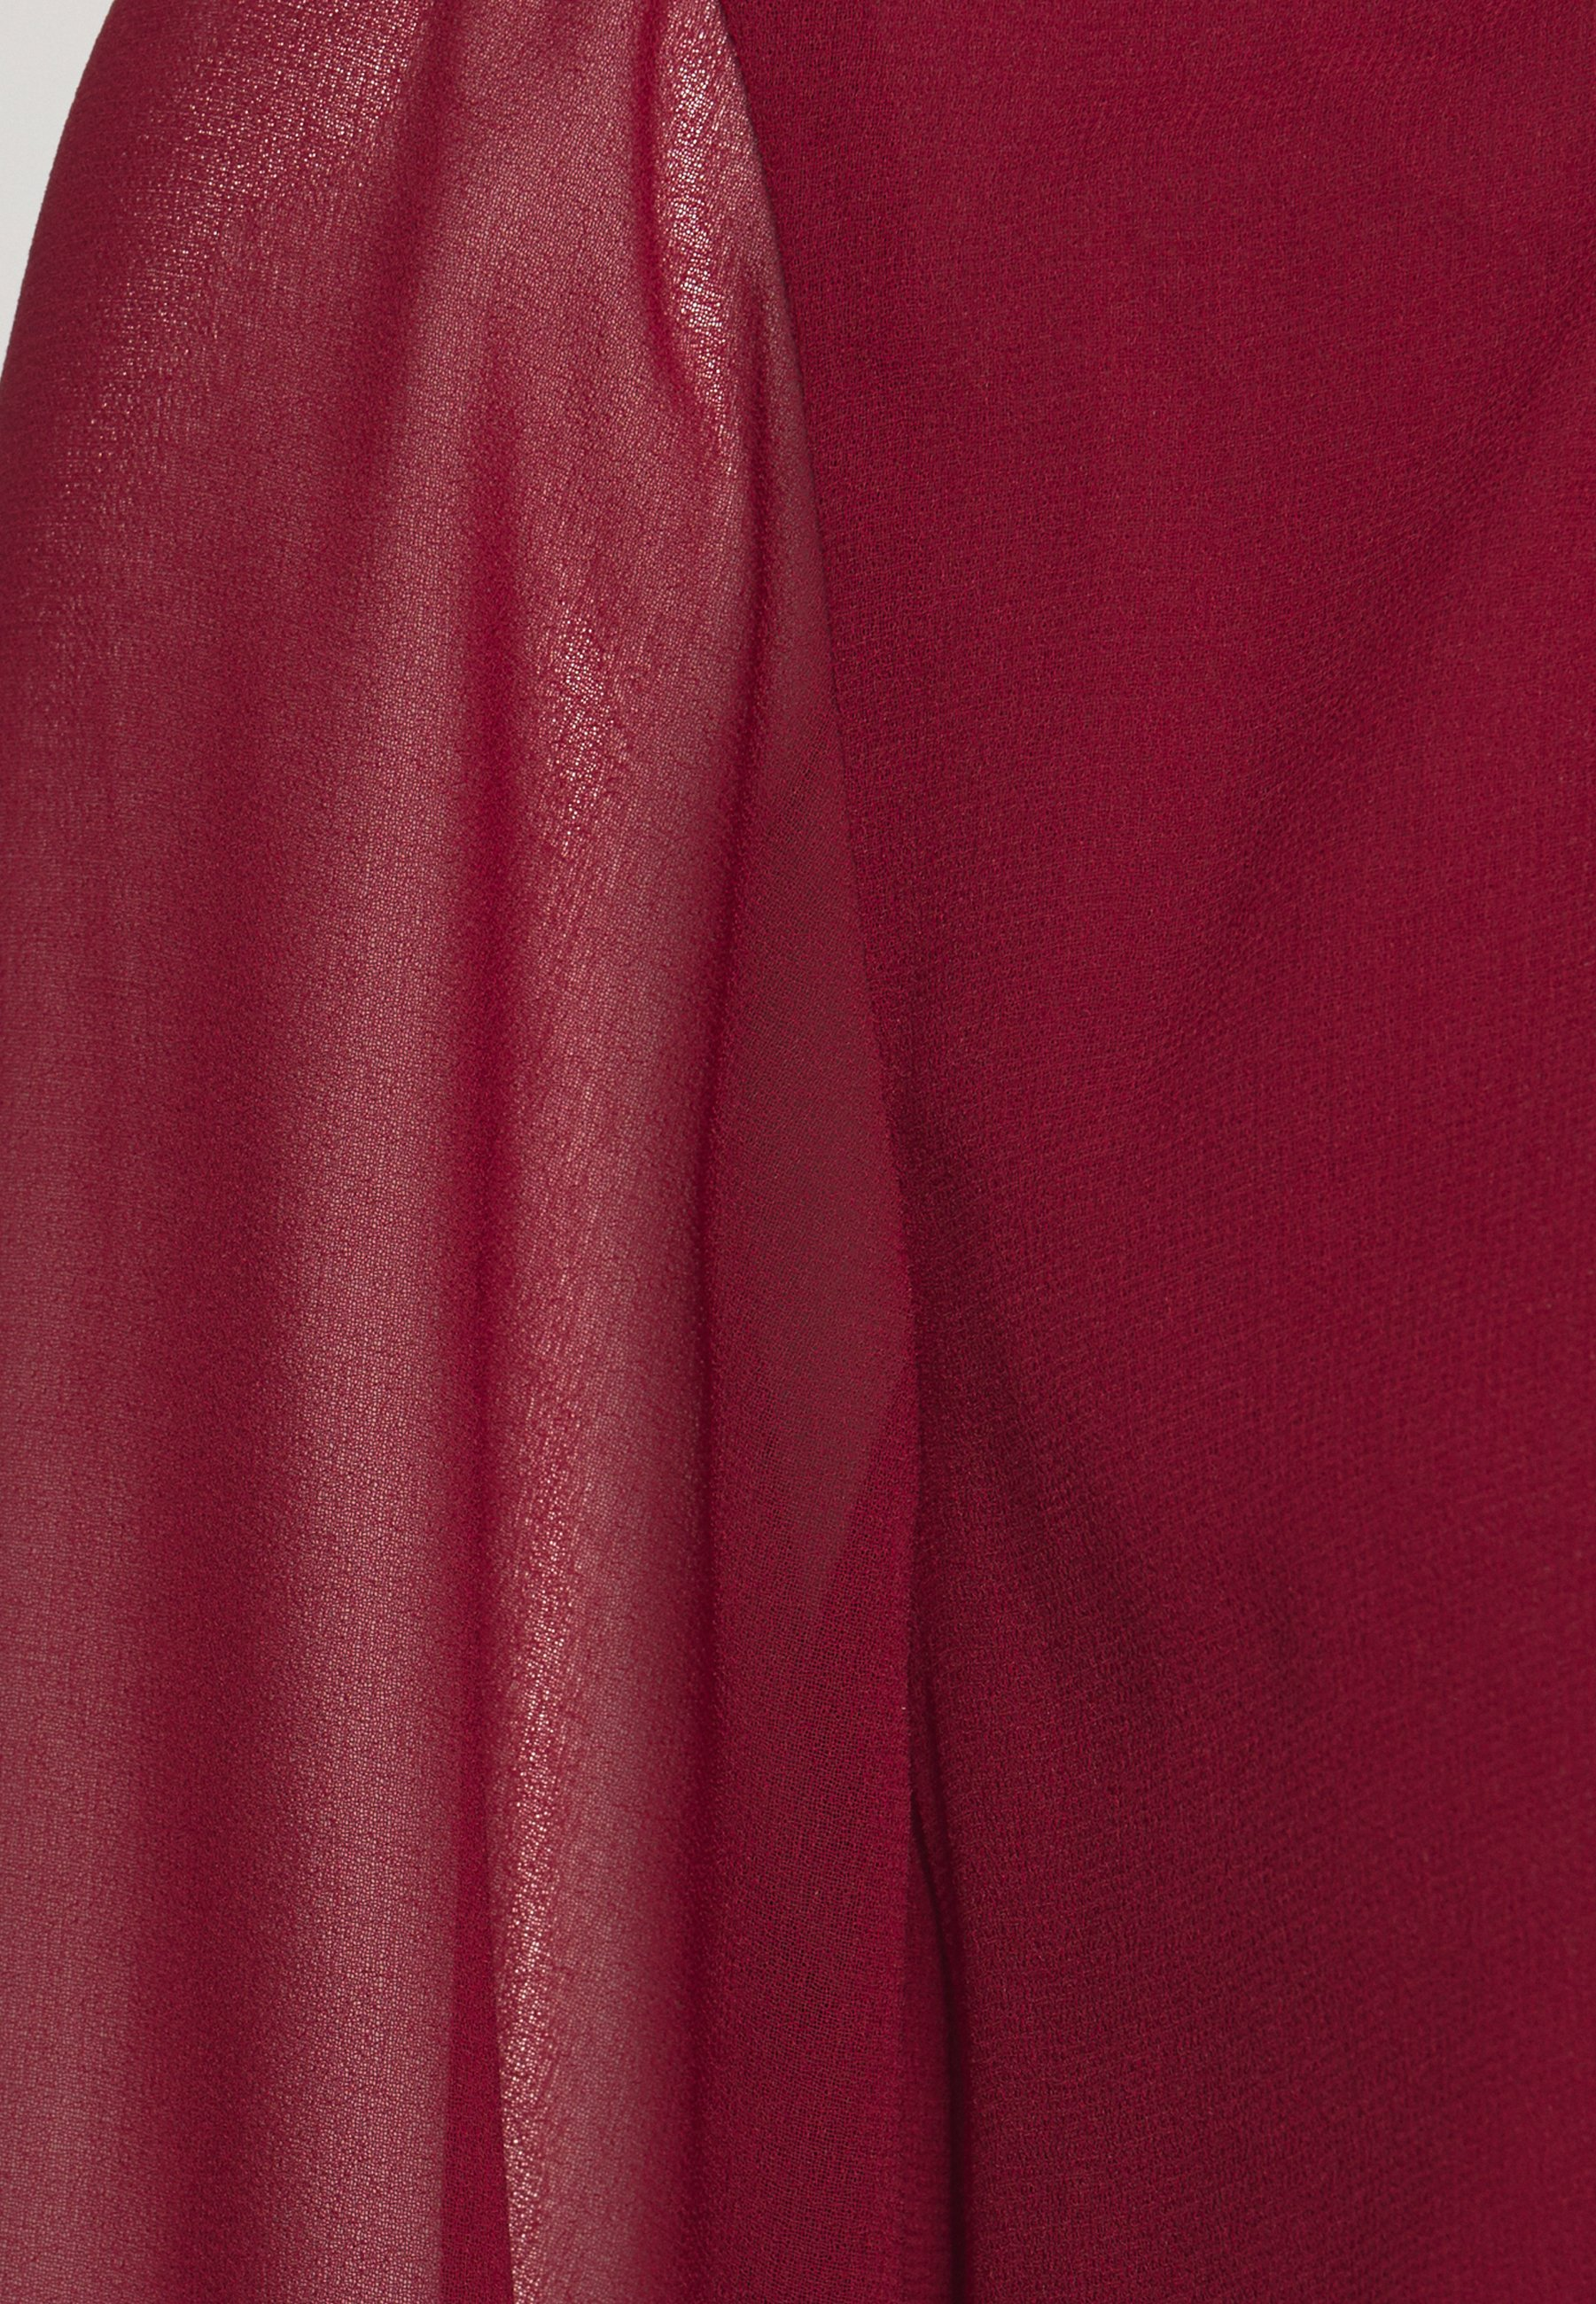 Top Quality Women's Clothing RIANI BLUSE Blouse amarena hKZ6OdzAt